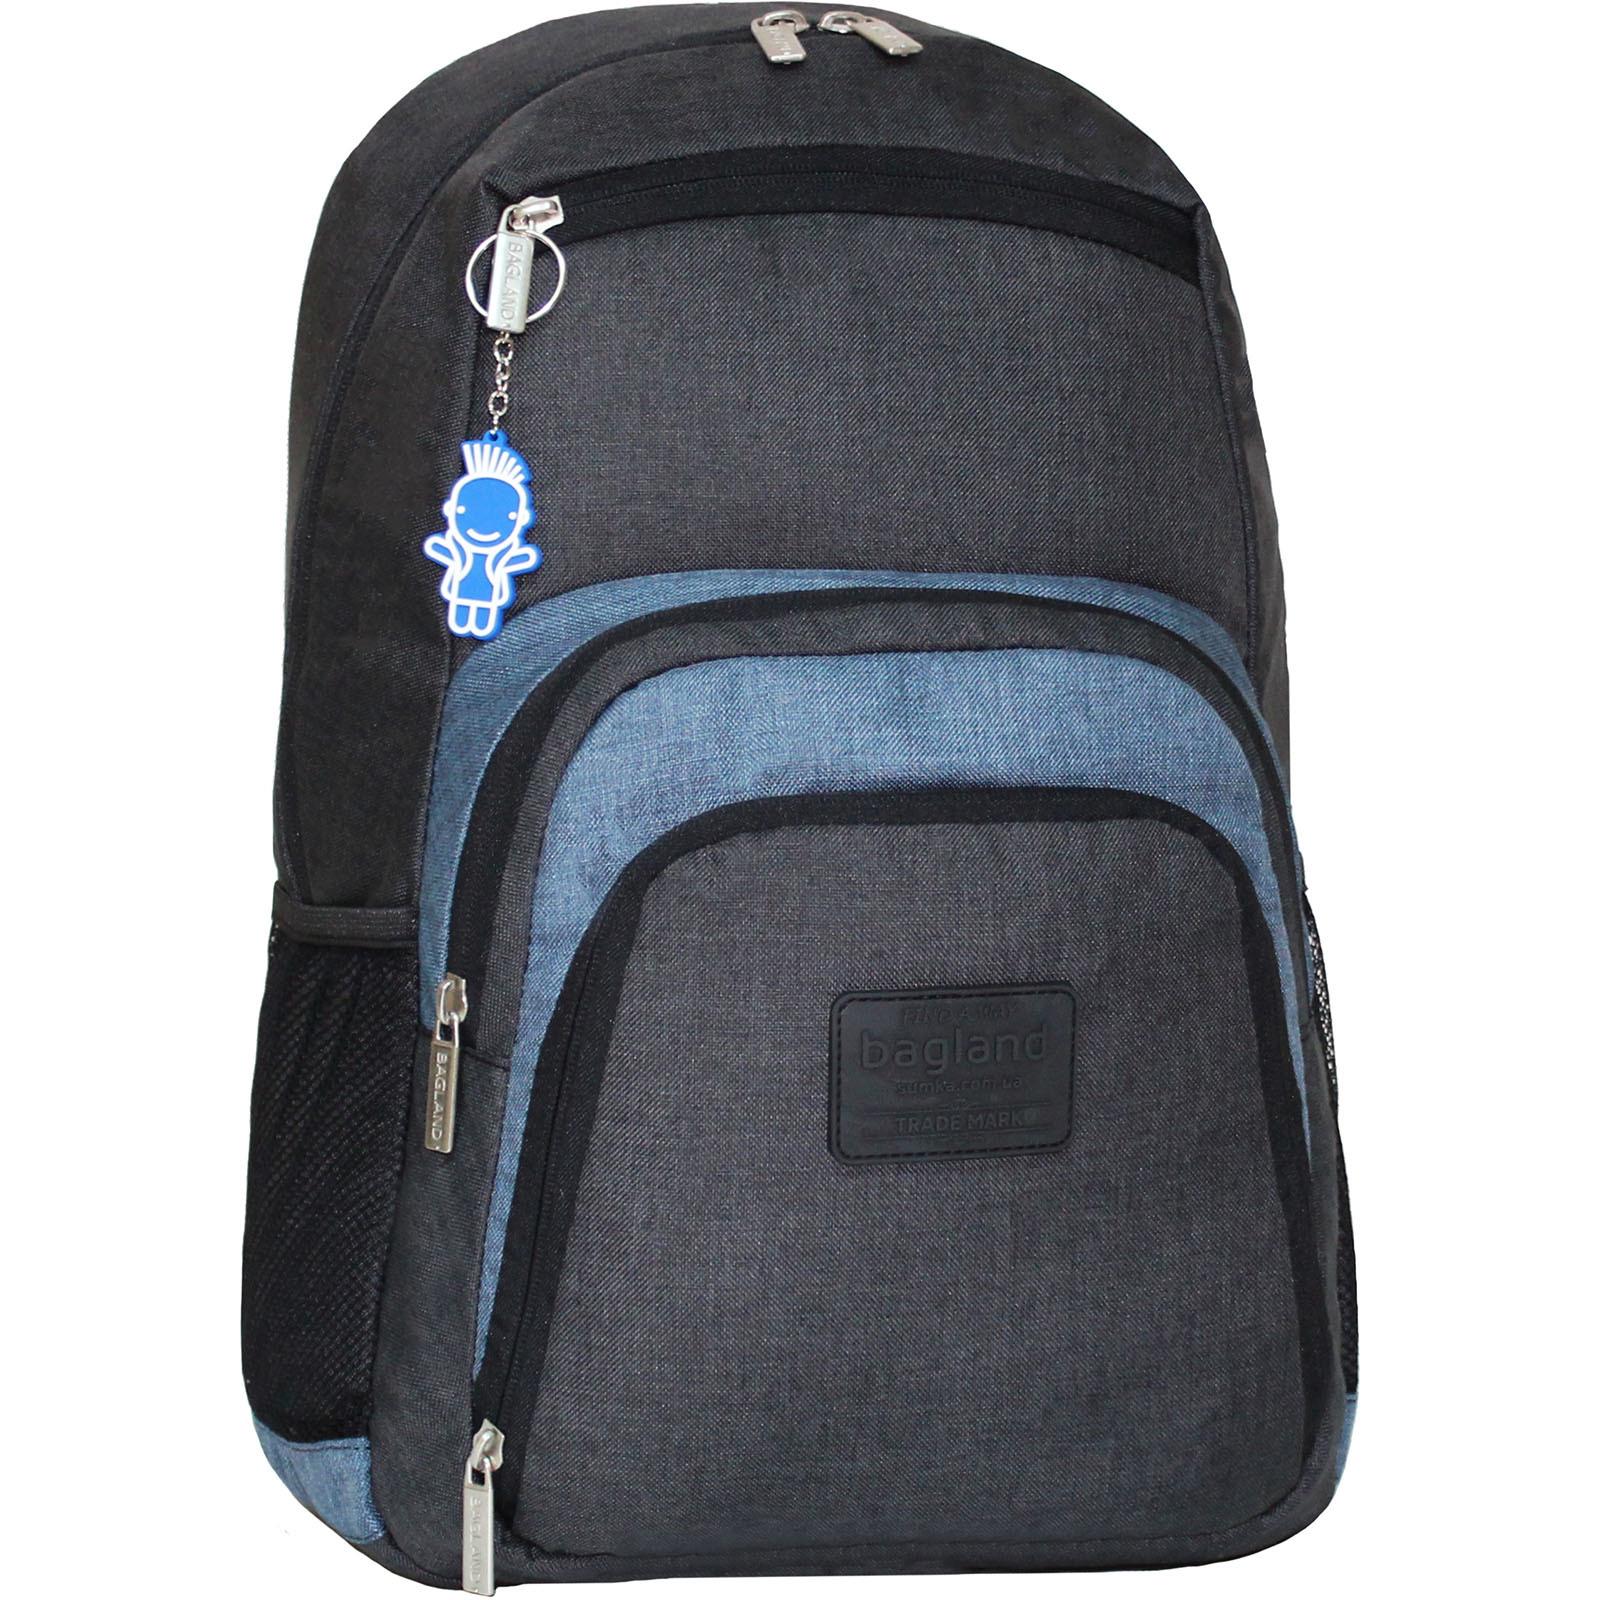 Рюкзаки для ноутбука Рюкзак для ноутбука Bagland Freestyle 21 л. черный/серый (0011969) IMG_2105.JPG